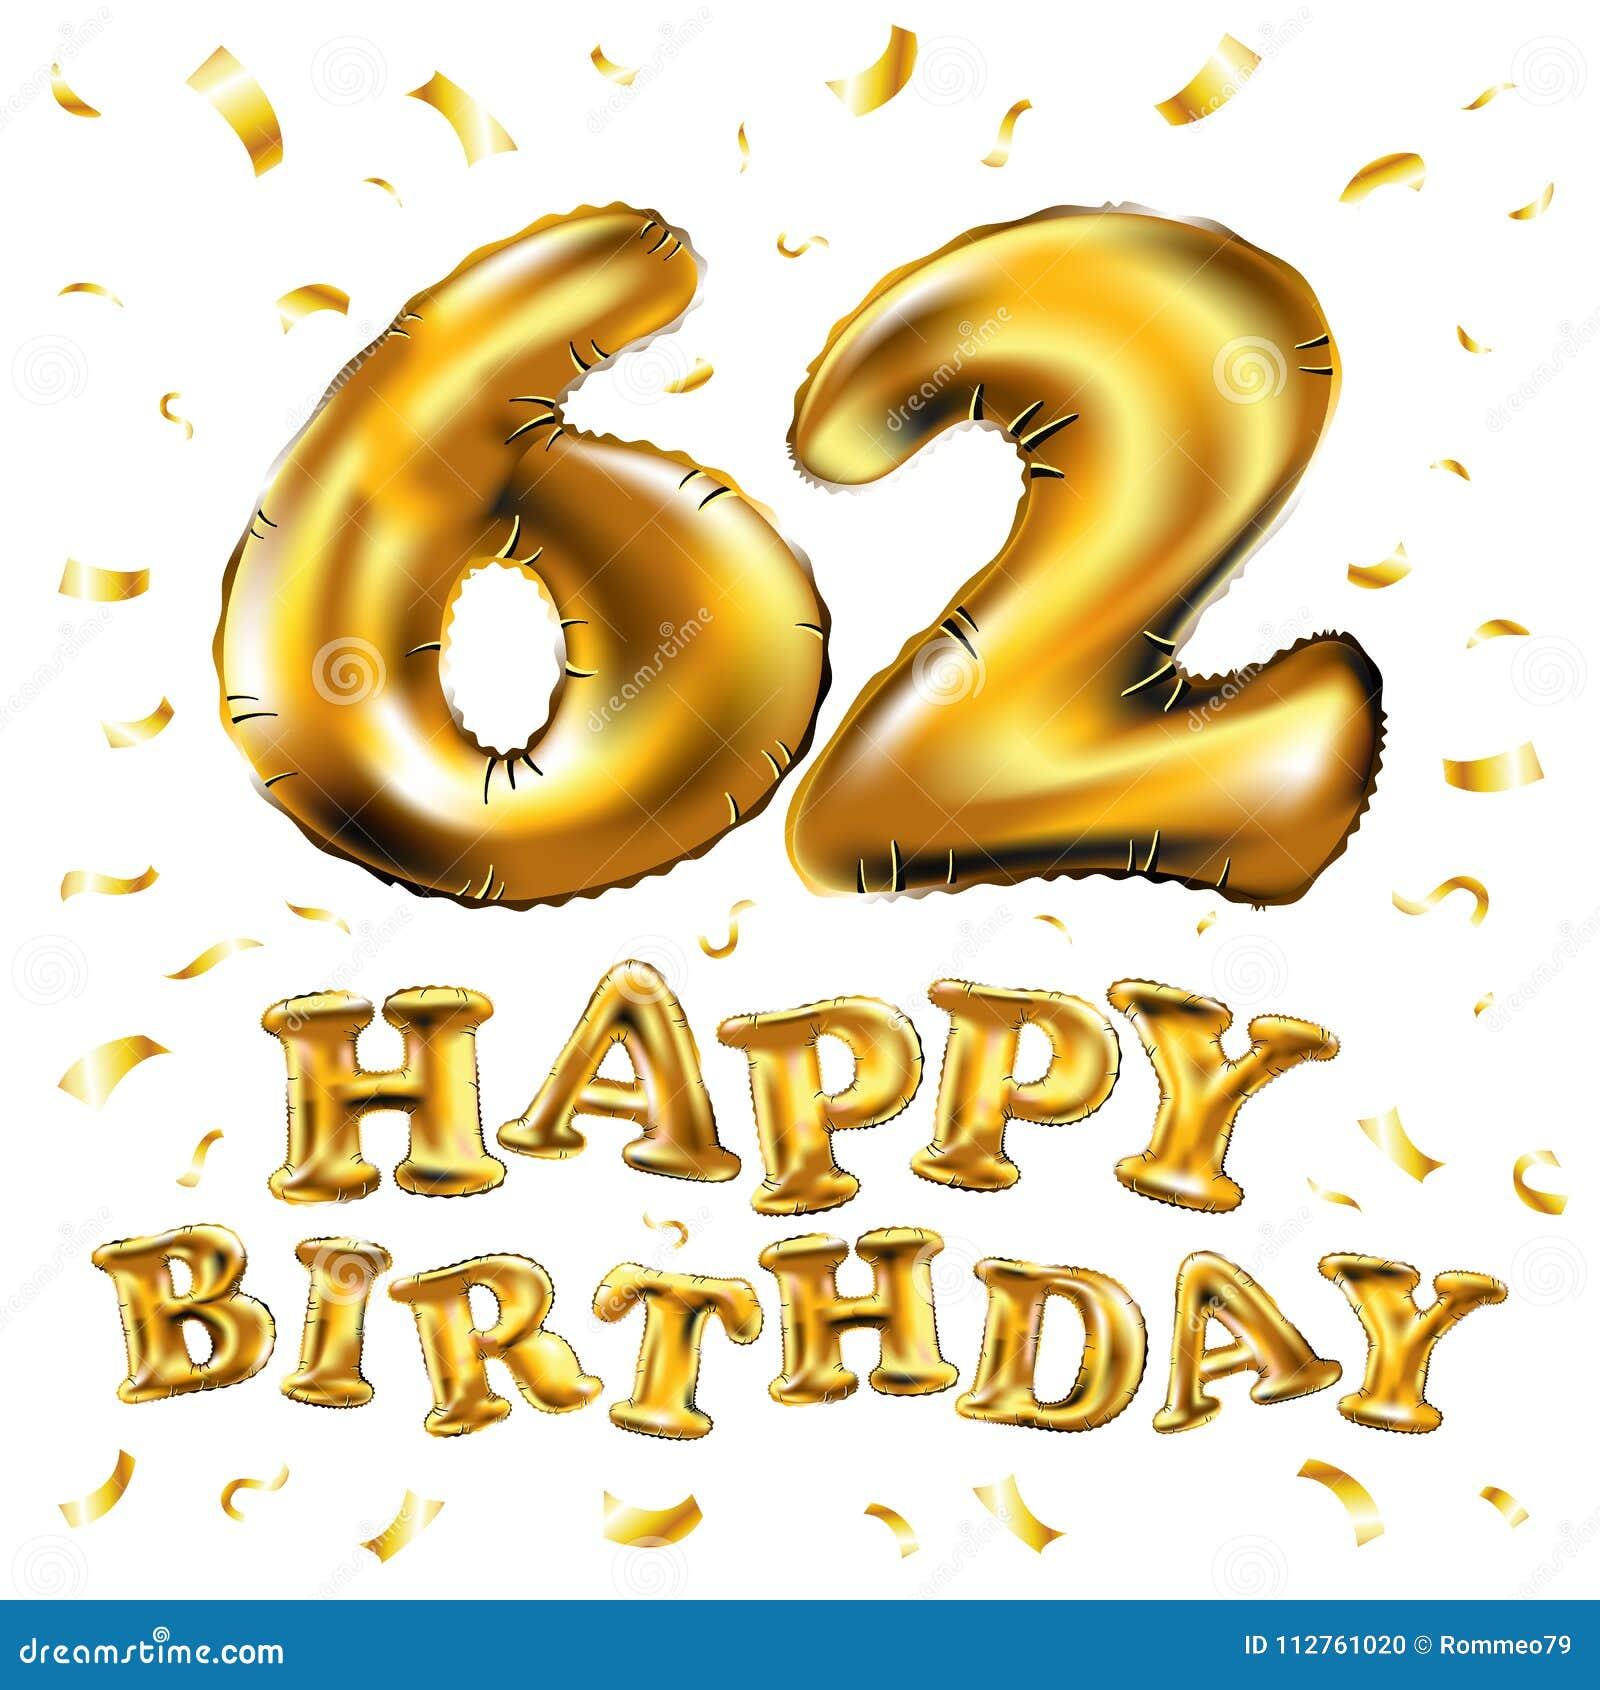 Vector happy birthday 62th celebration gold balloons and golden download vector happy birthday 62th celebration gold balloons and golden confetti glitters 3d illustration design m4hsunfo